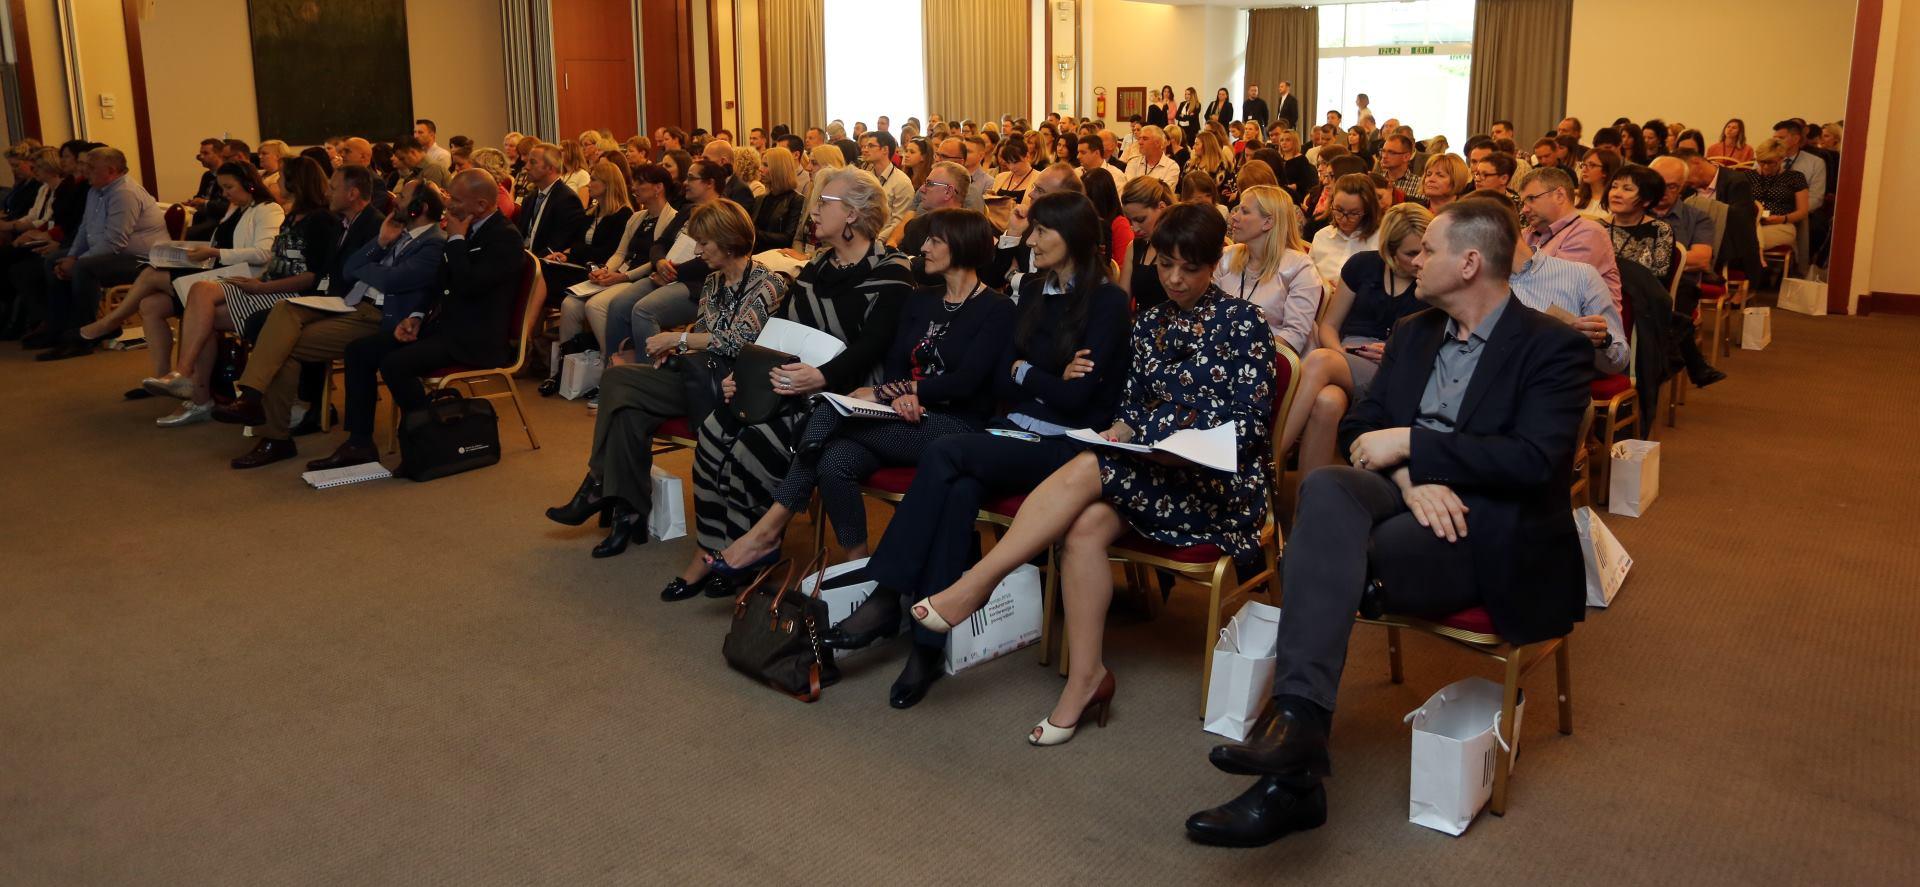 Završen prvi dan konferencije 'Prakse javne nabave država članica EU'